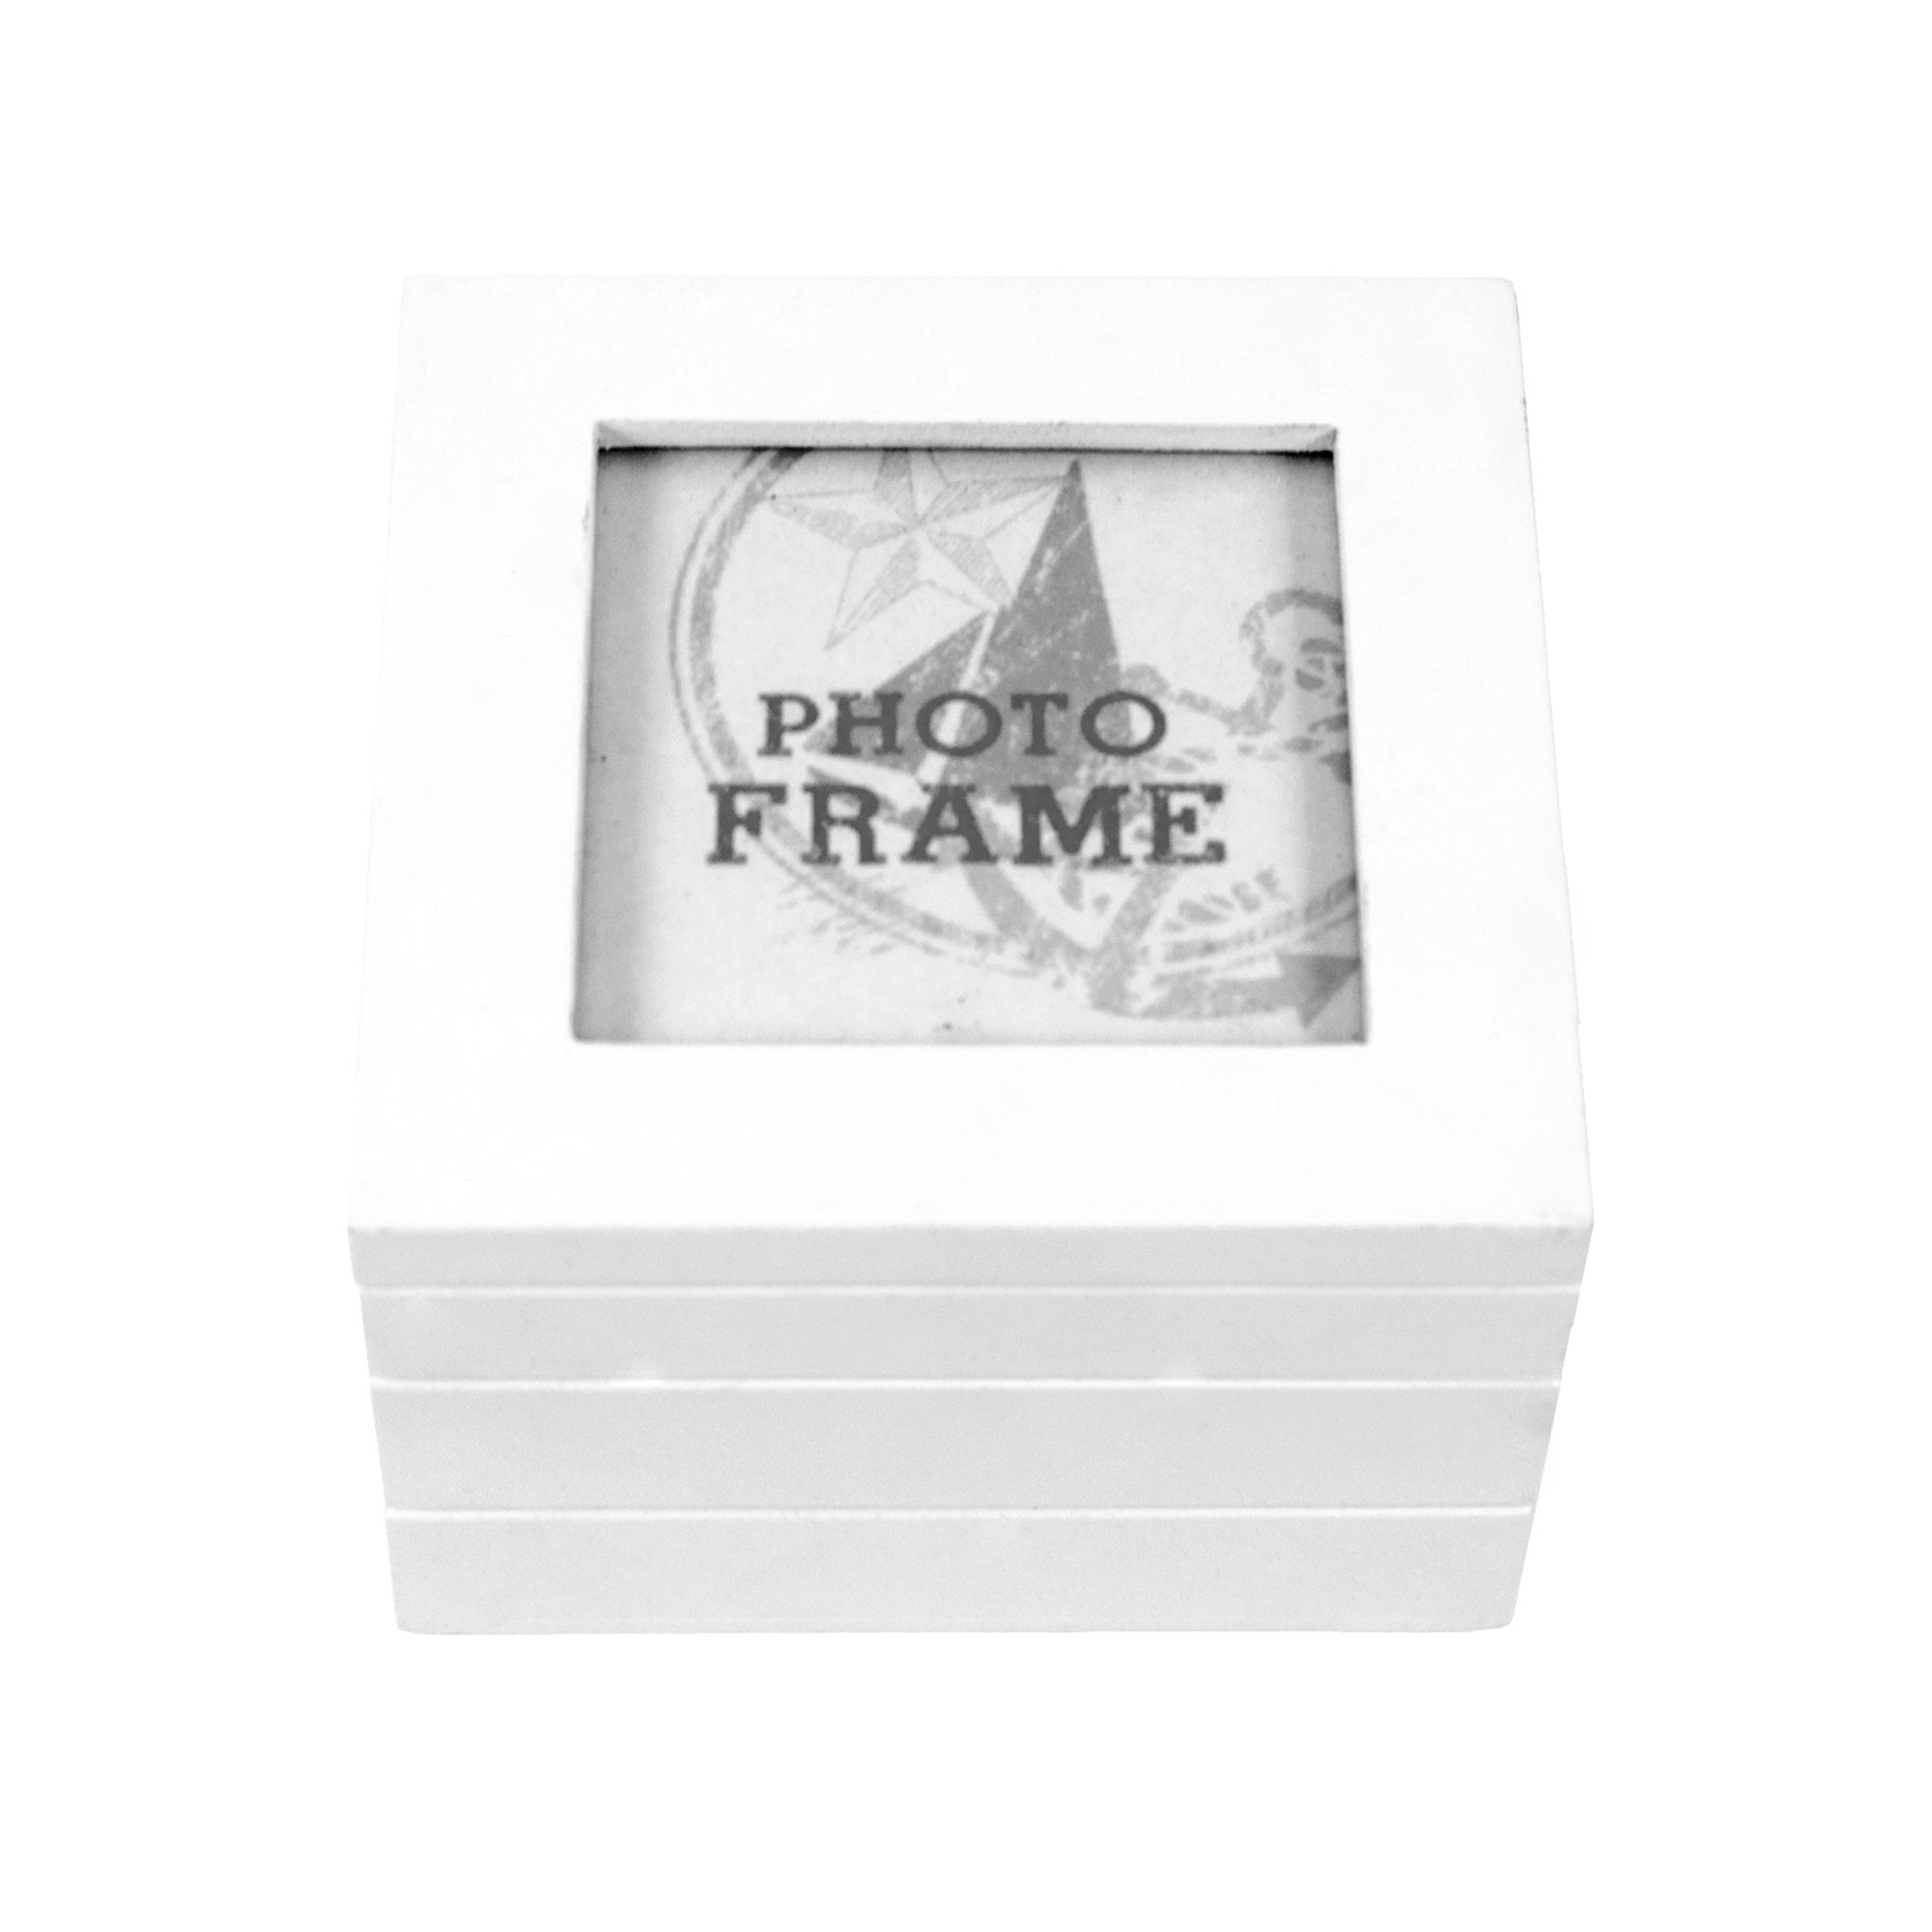 The Hamptons Collection Small Ridged Trinket Box